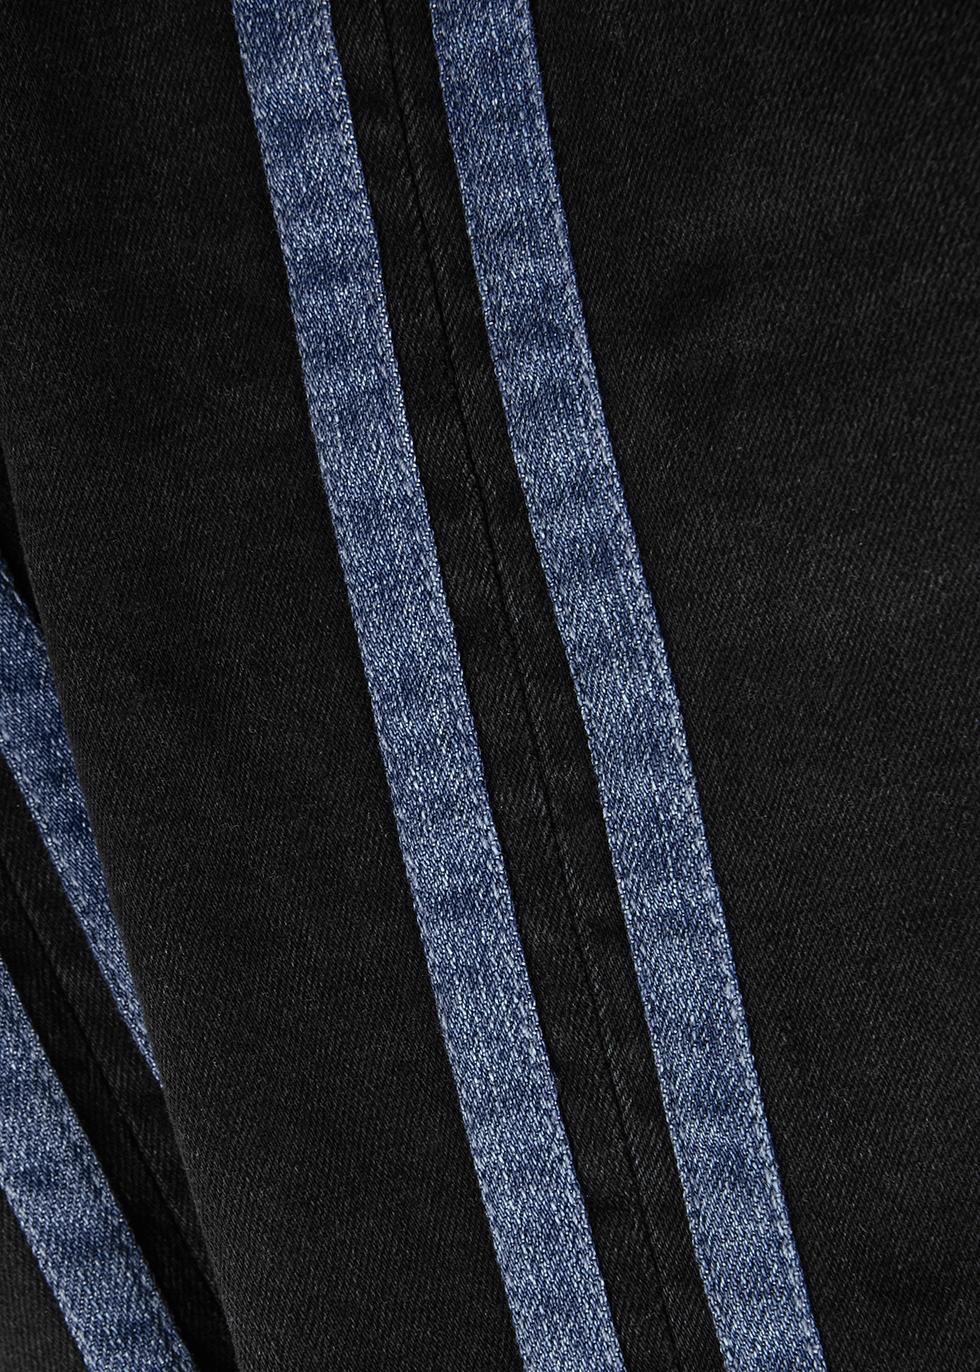 Ankle Dre striped skinny jeans - rag & bone